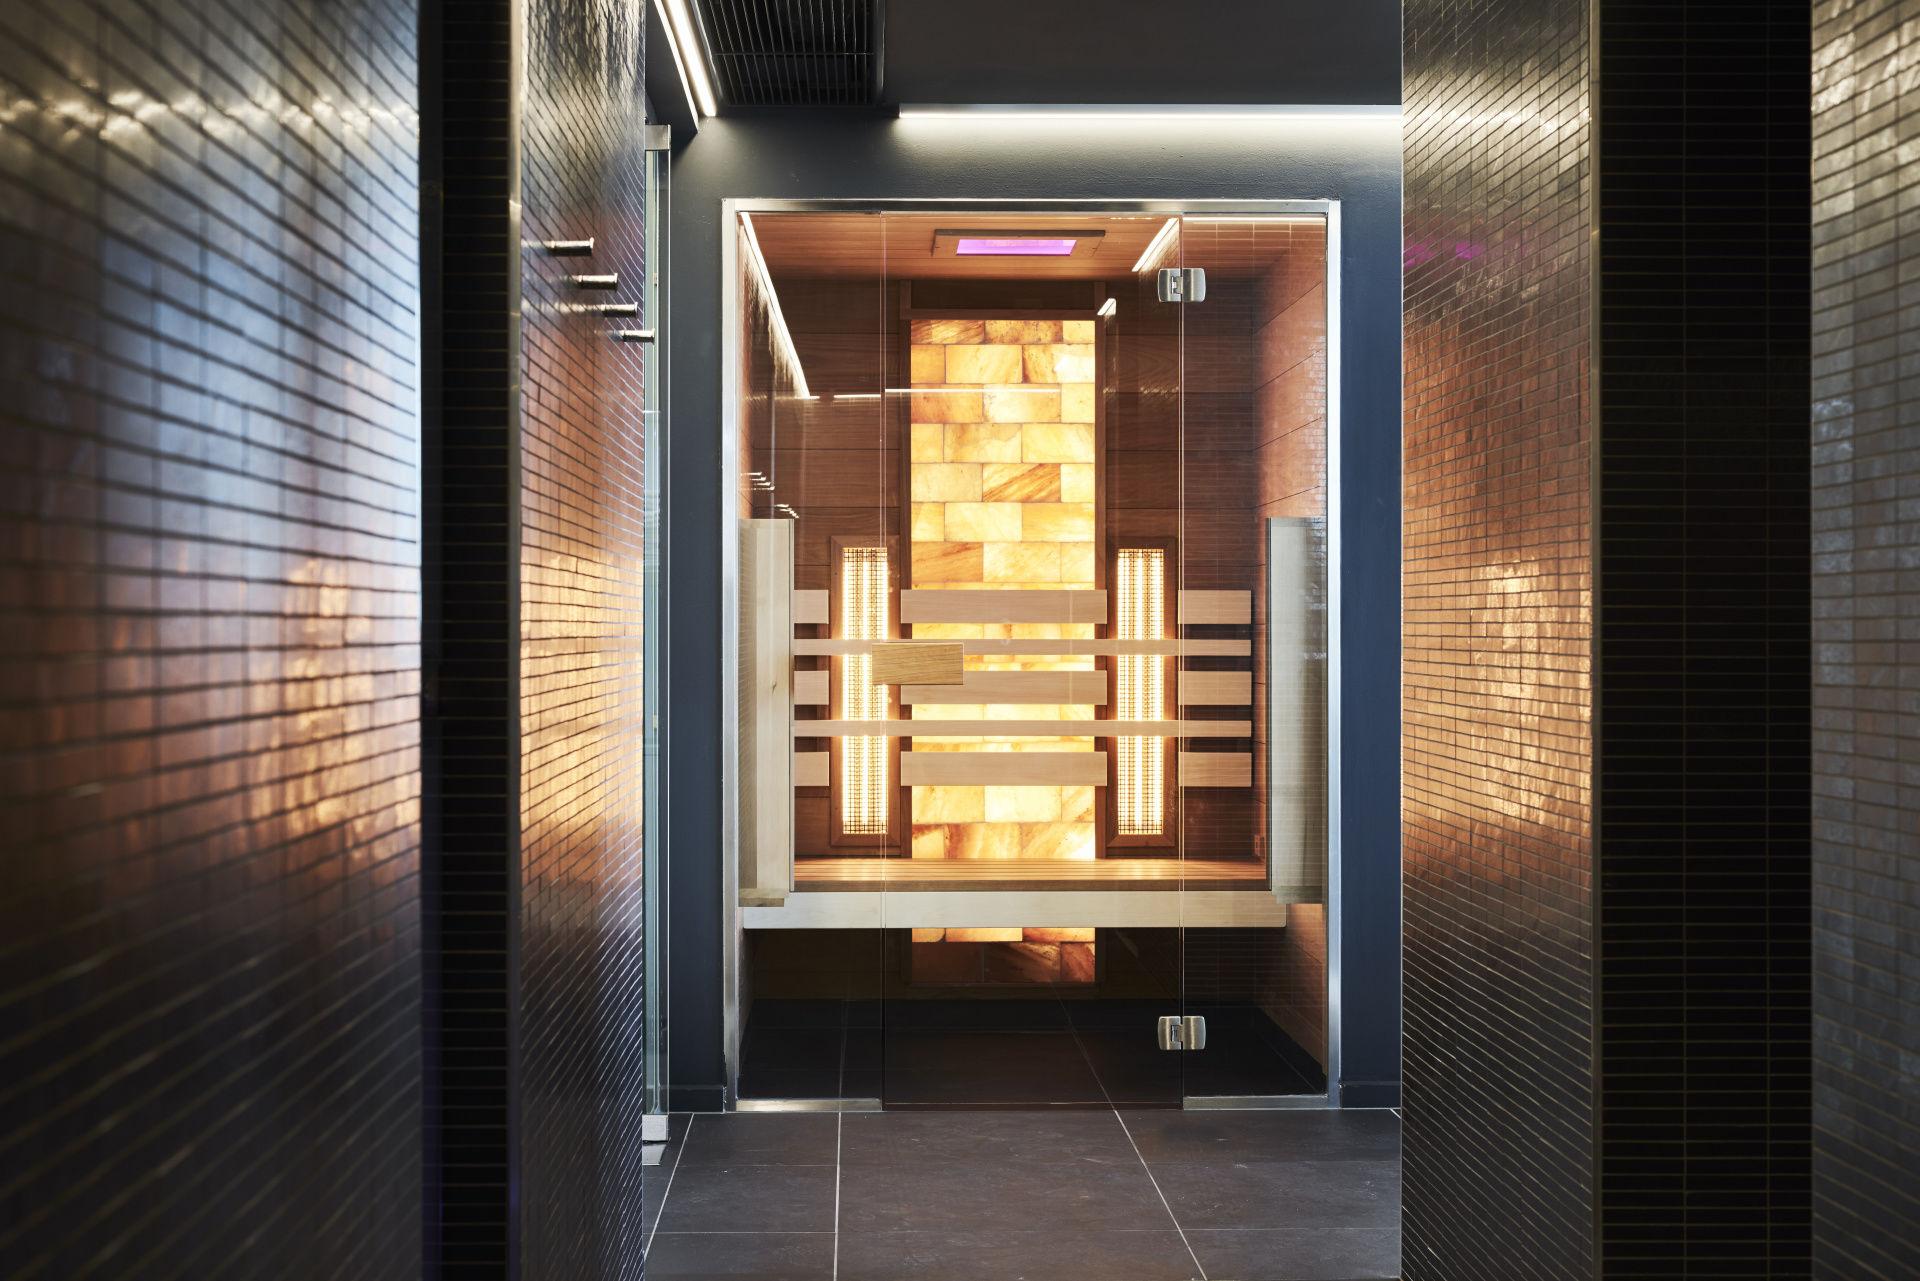 Hotel Sopron - infraszauna és sókabin